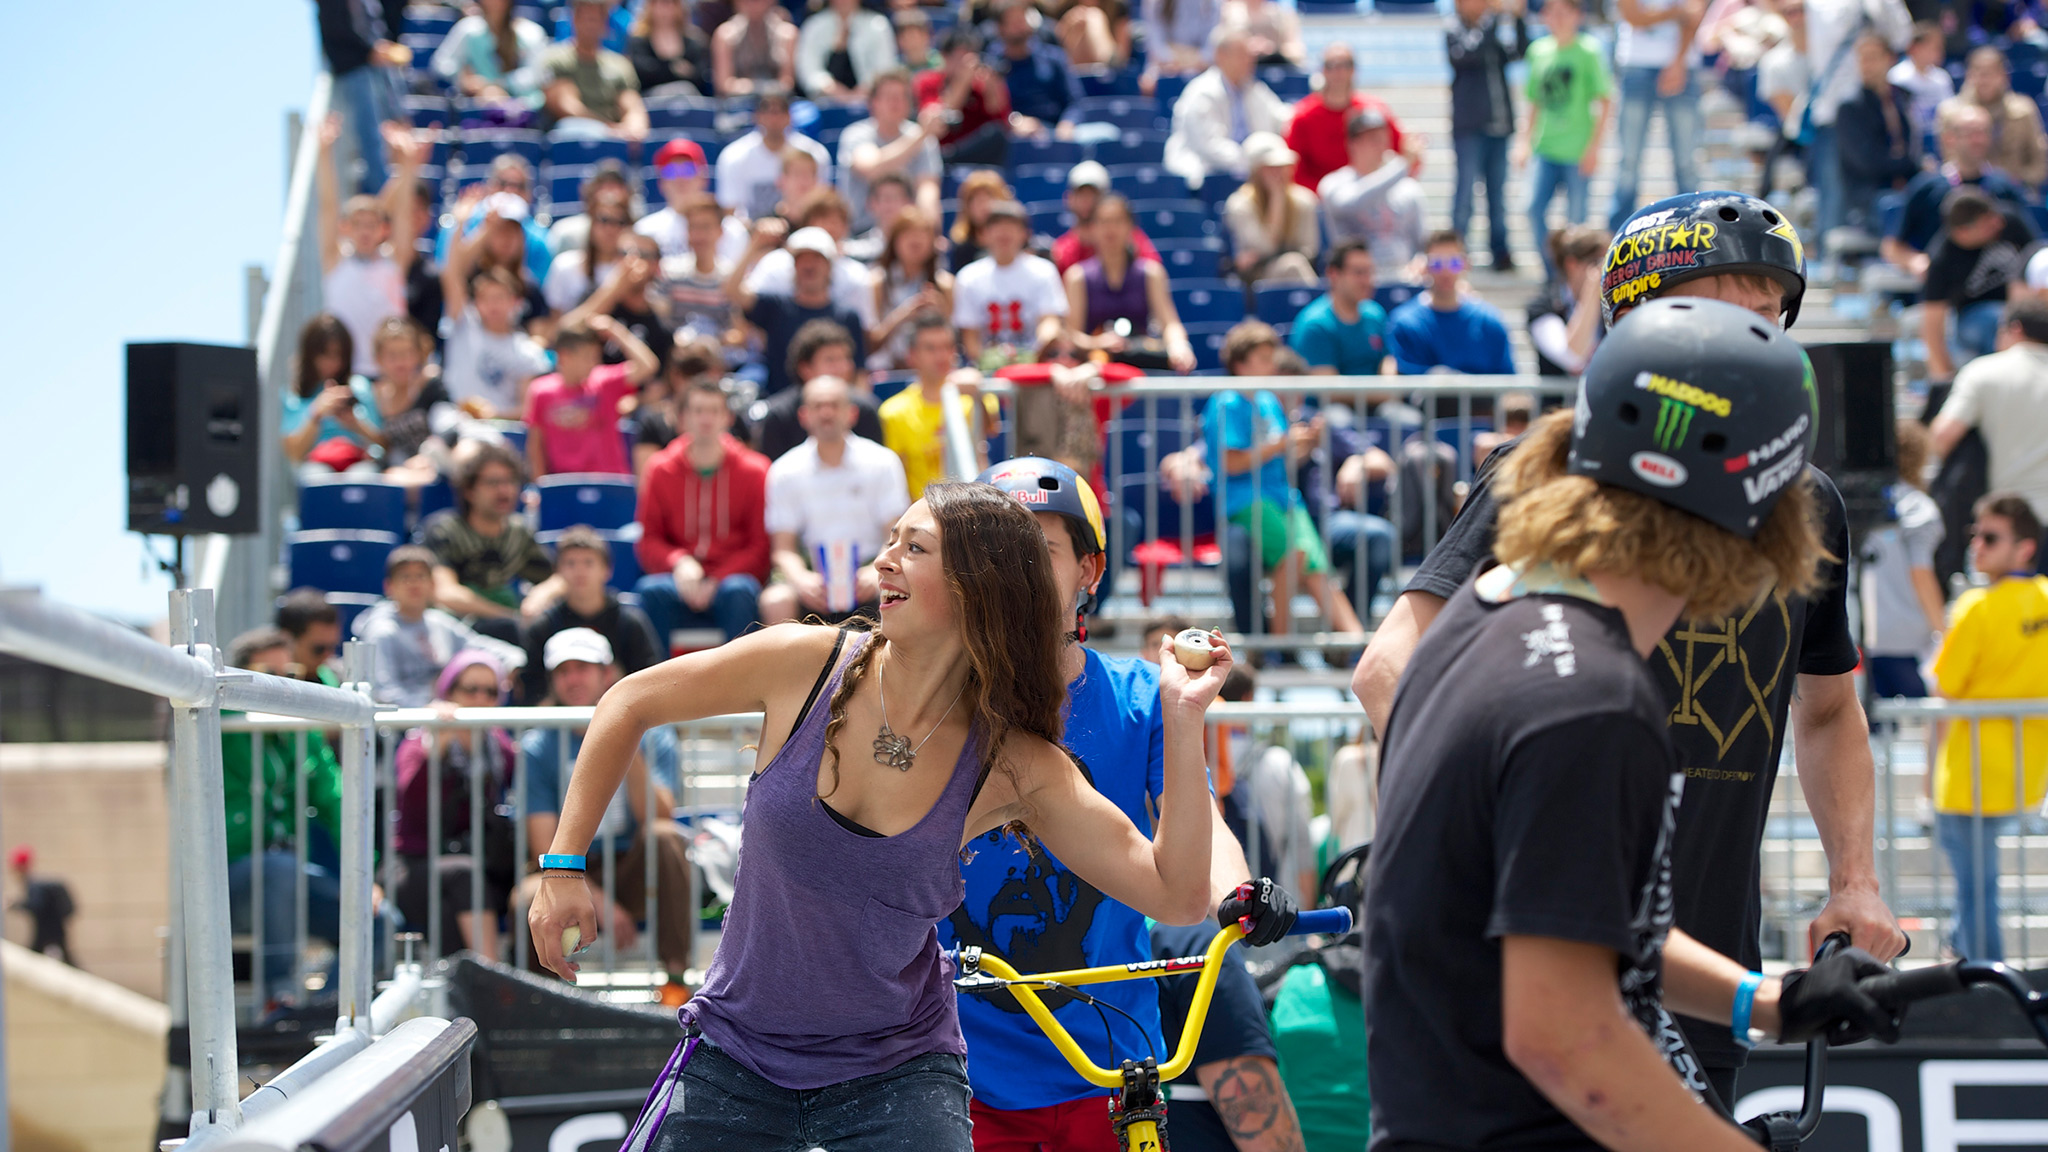 Lizzie Armanto -- Women's Skateboard Park